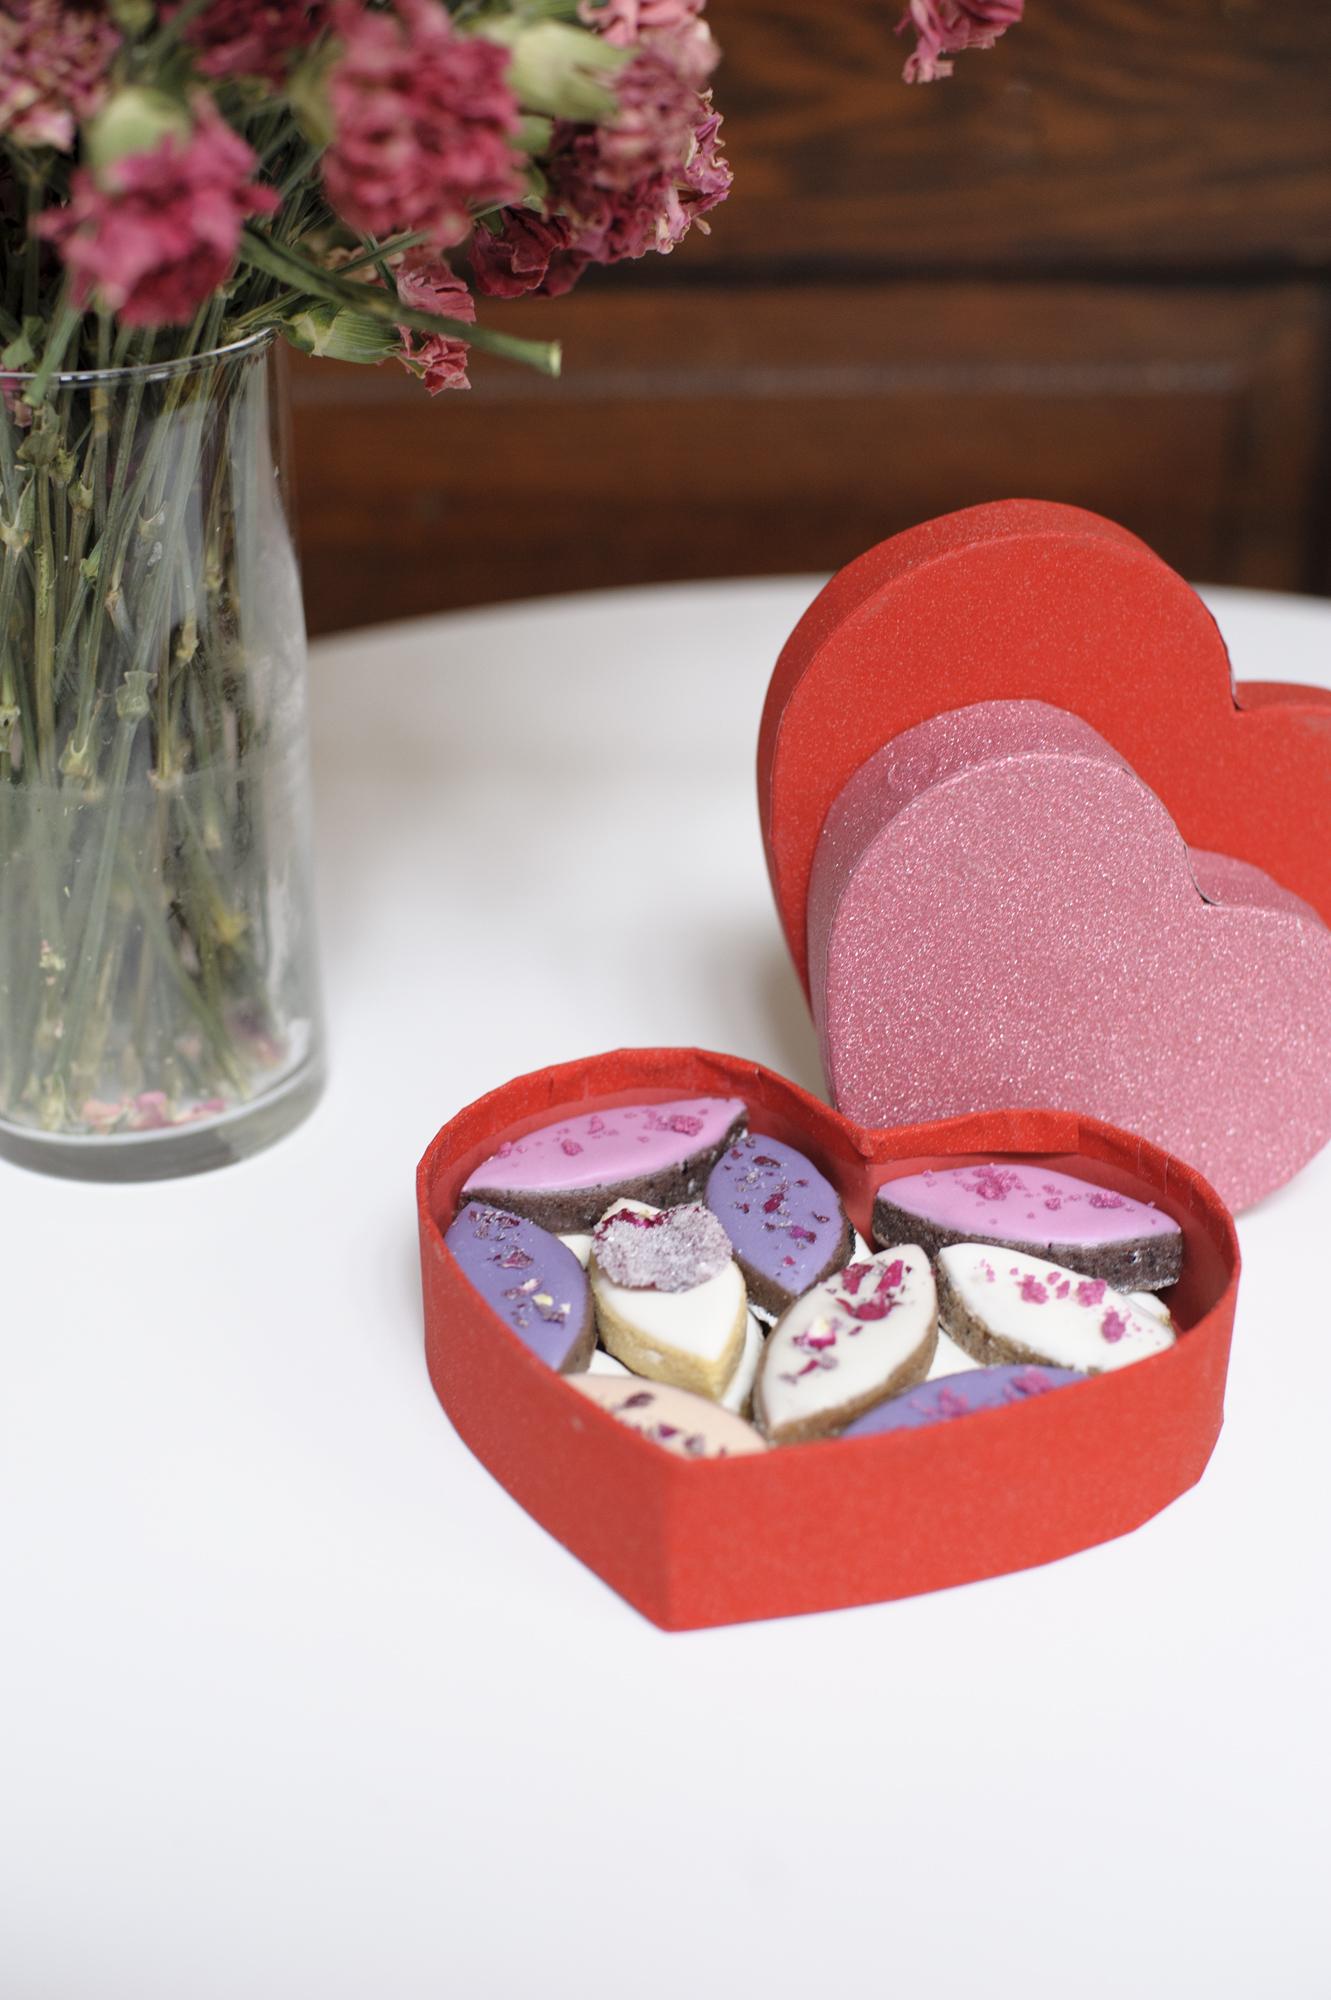 dana-confections-valentines-2017_carmen-ladipo_18.jpg